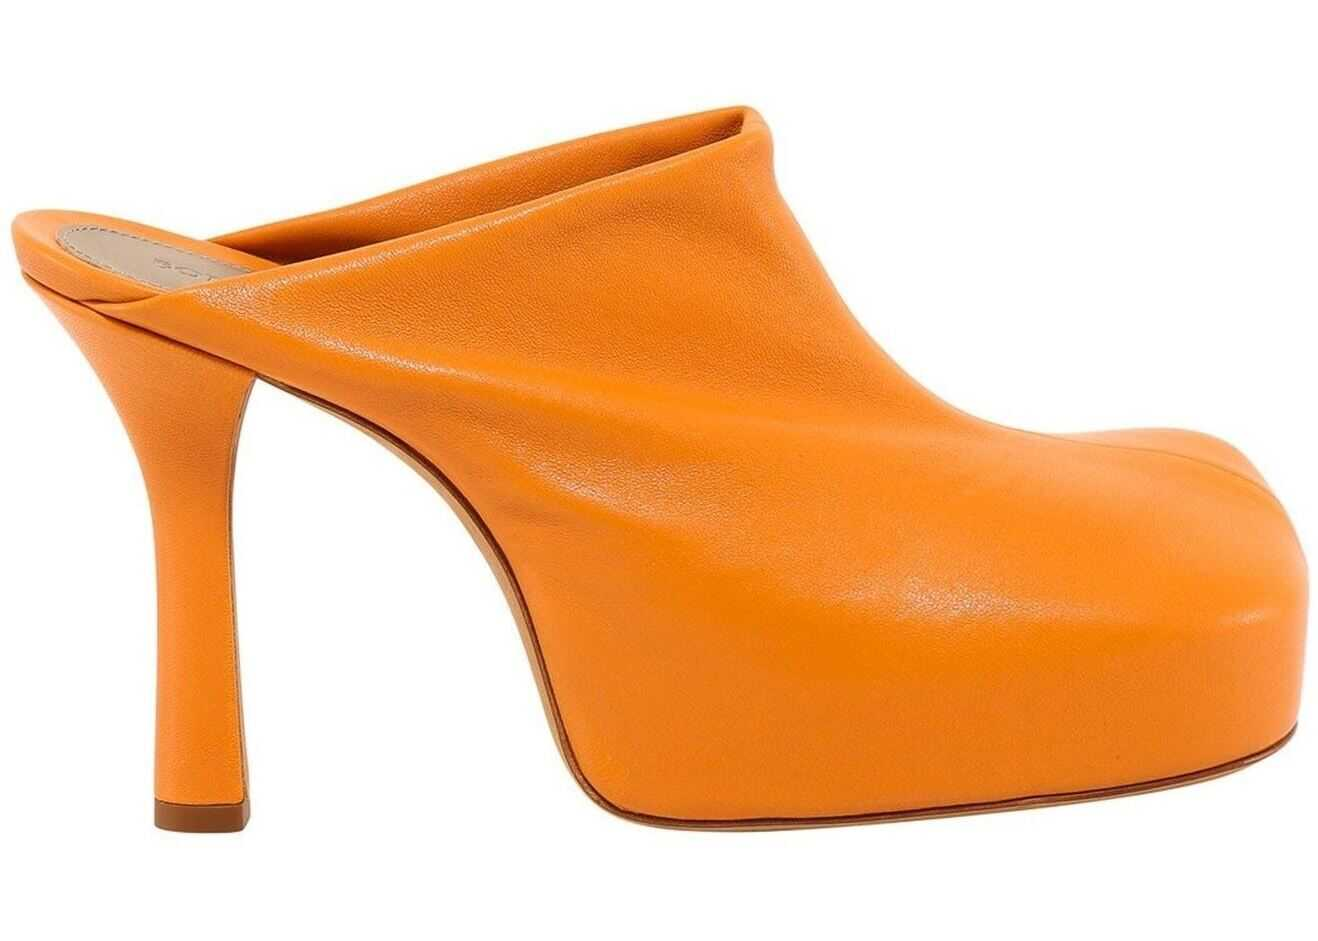 Bottega Veneta Leather Heeled Mules In Orange 630148 VBP40 7648 Orange imagine b-mall.ro